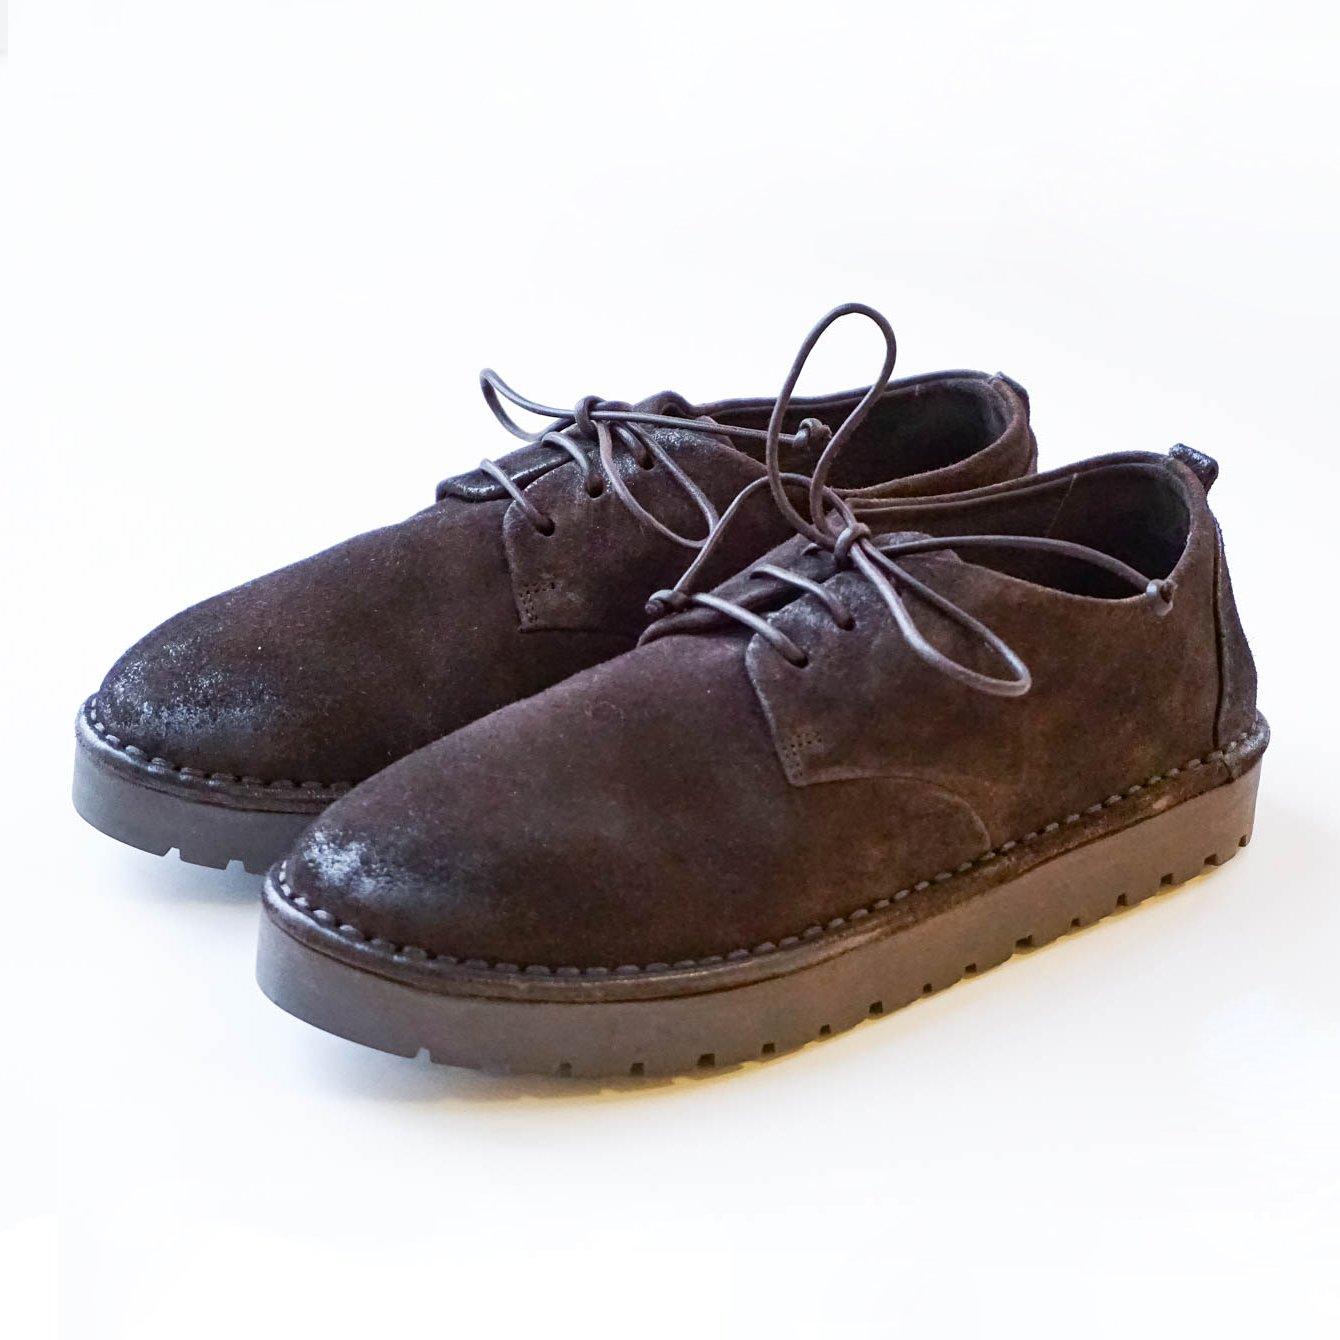 Gomme Derby Shoes - Dark Brown | Garmentory